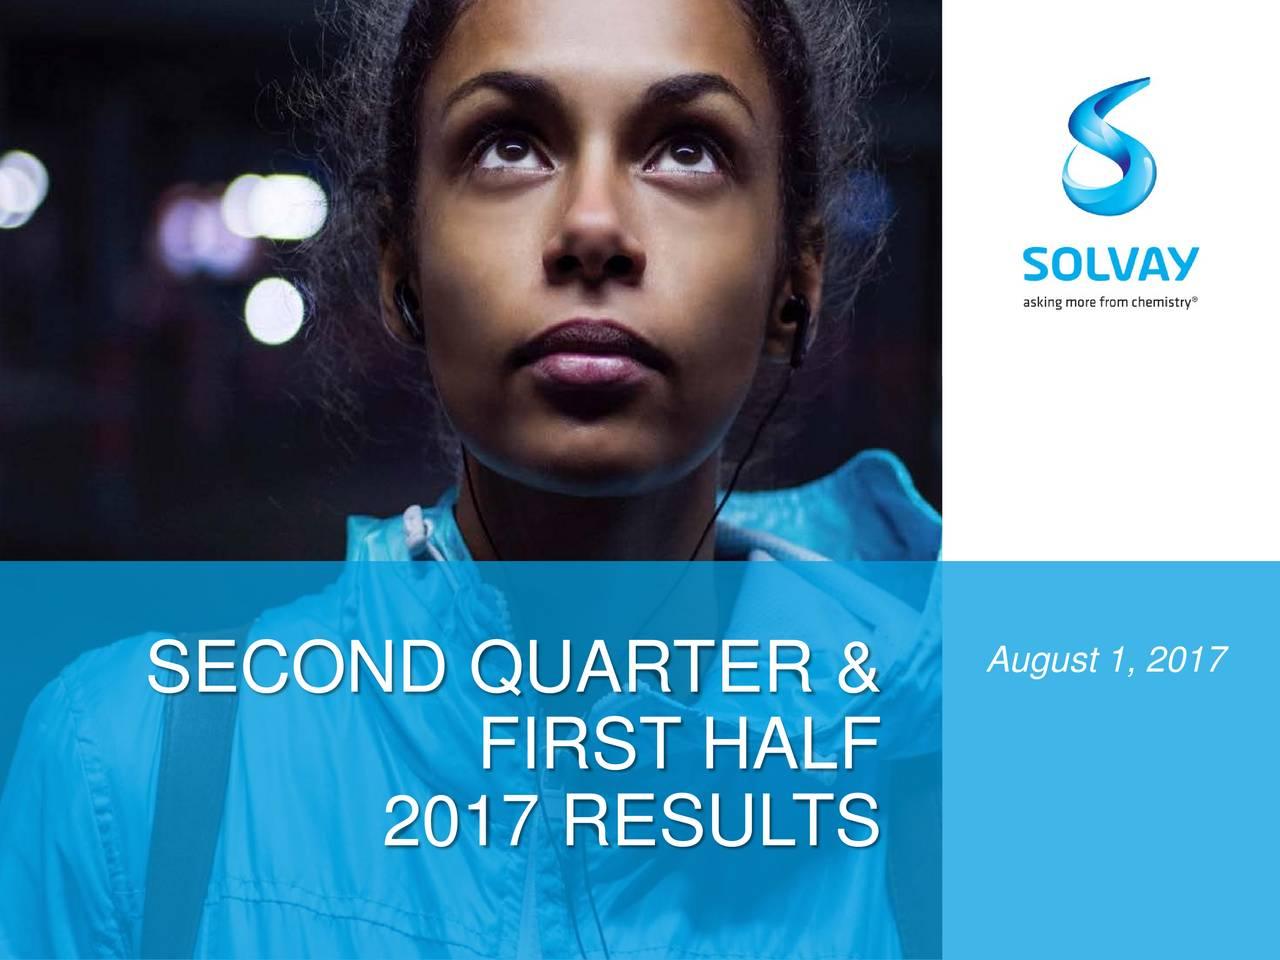 SECOND QUARTER & FIRST HALF 2017 RESULTS